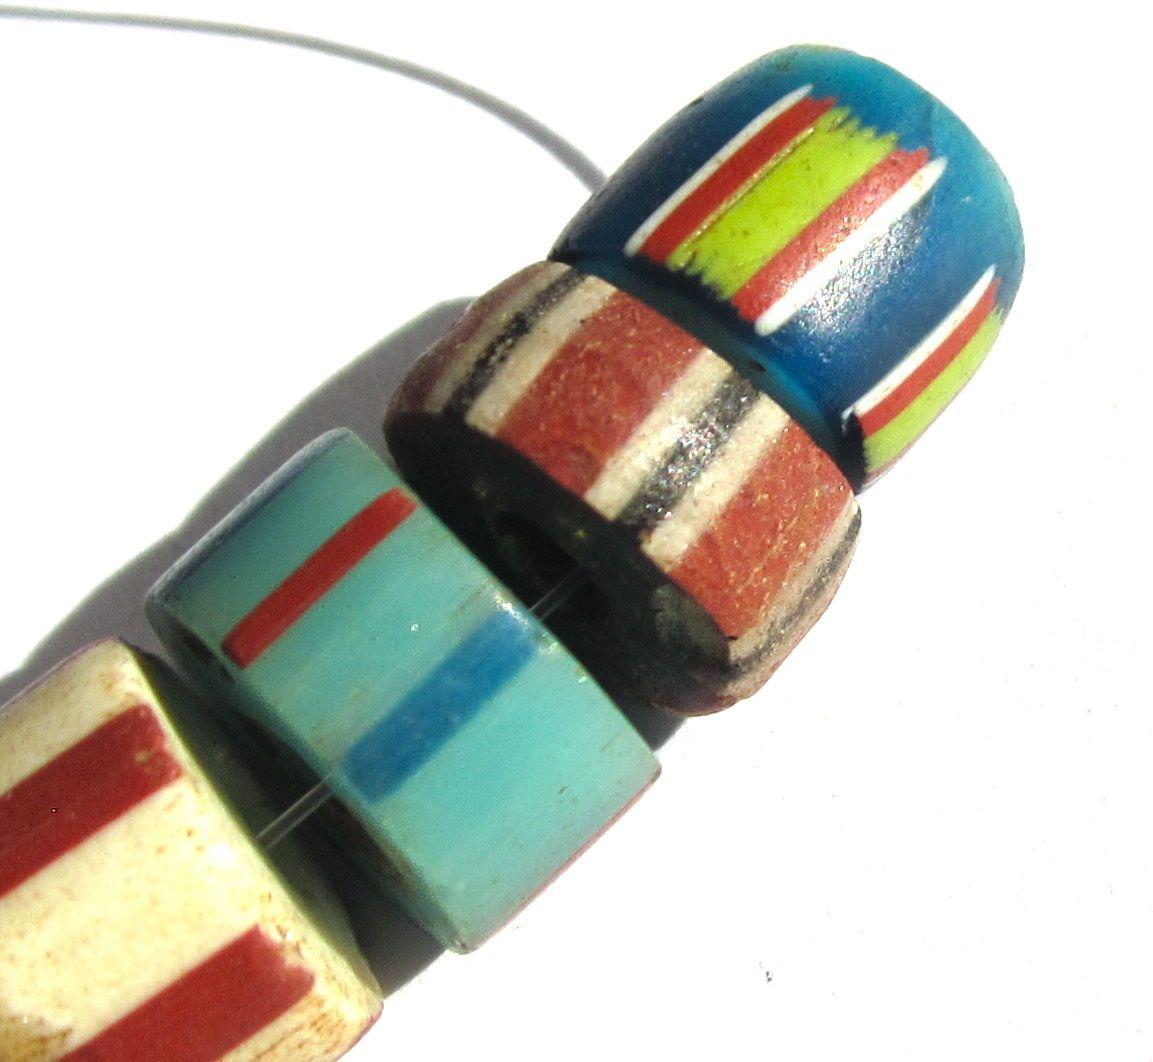 7 RARE Old Mixed Striped Venetian Dutch Chevron Trade Beads | eBay